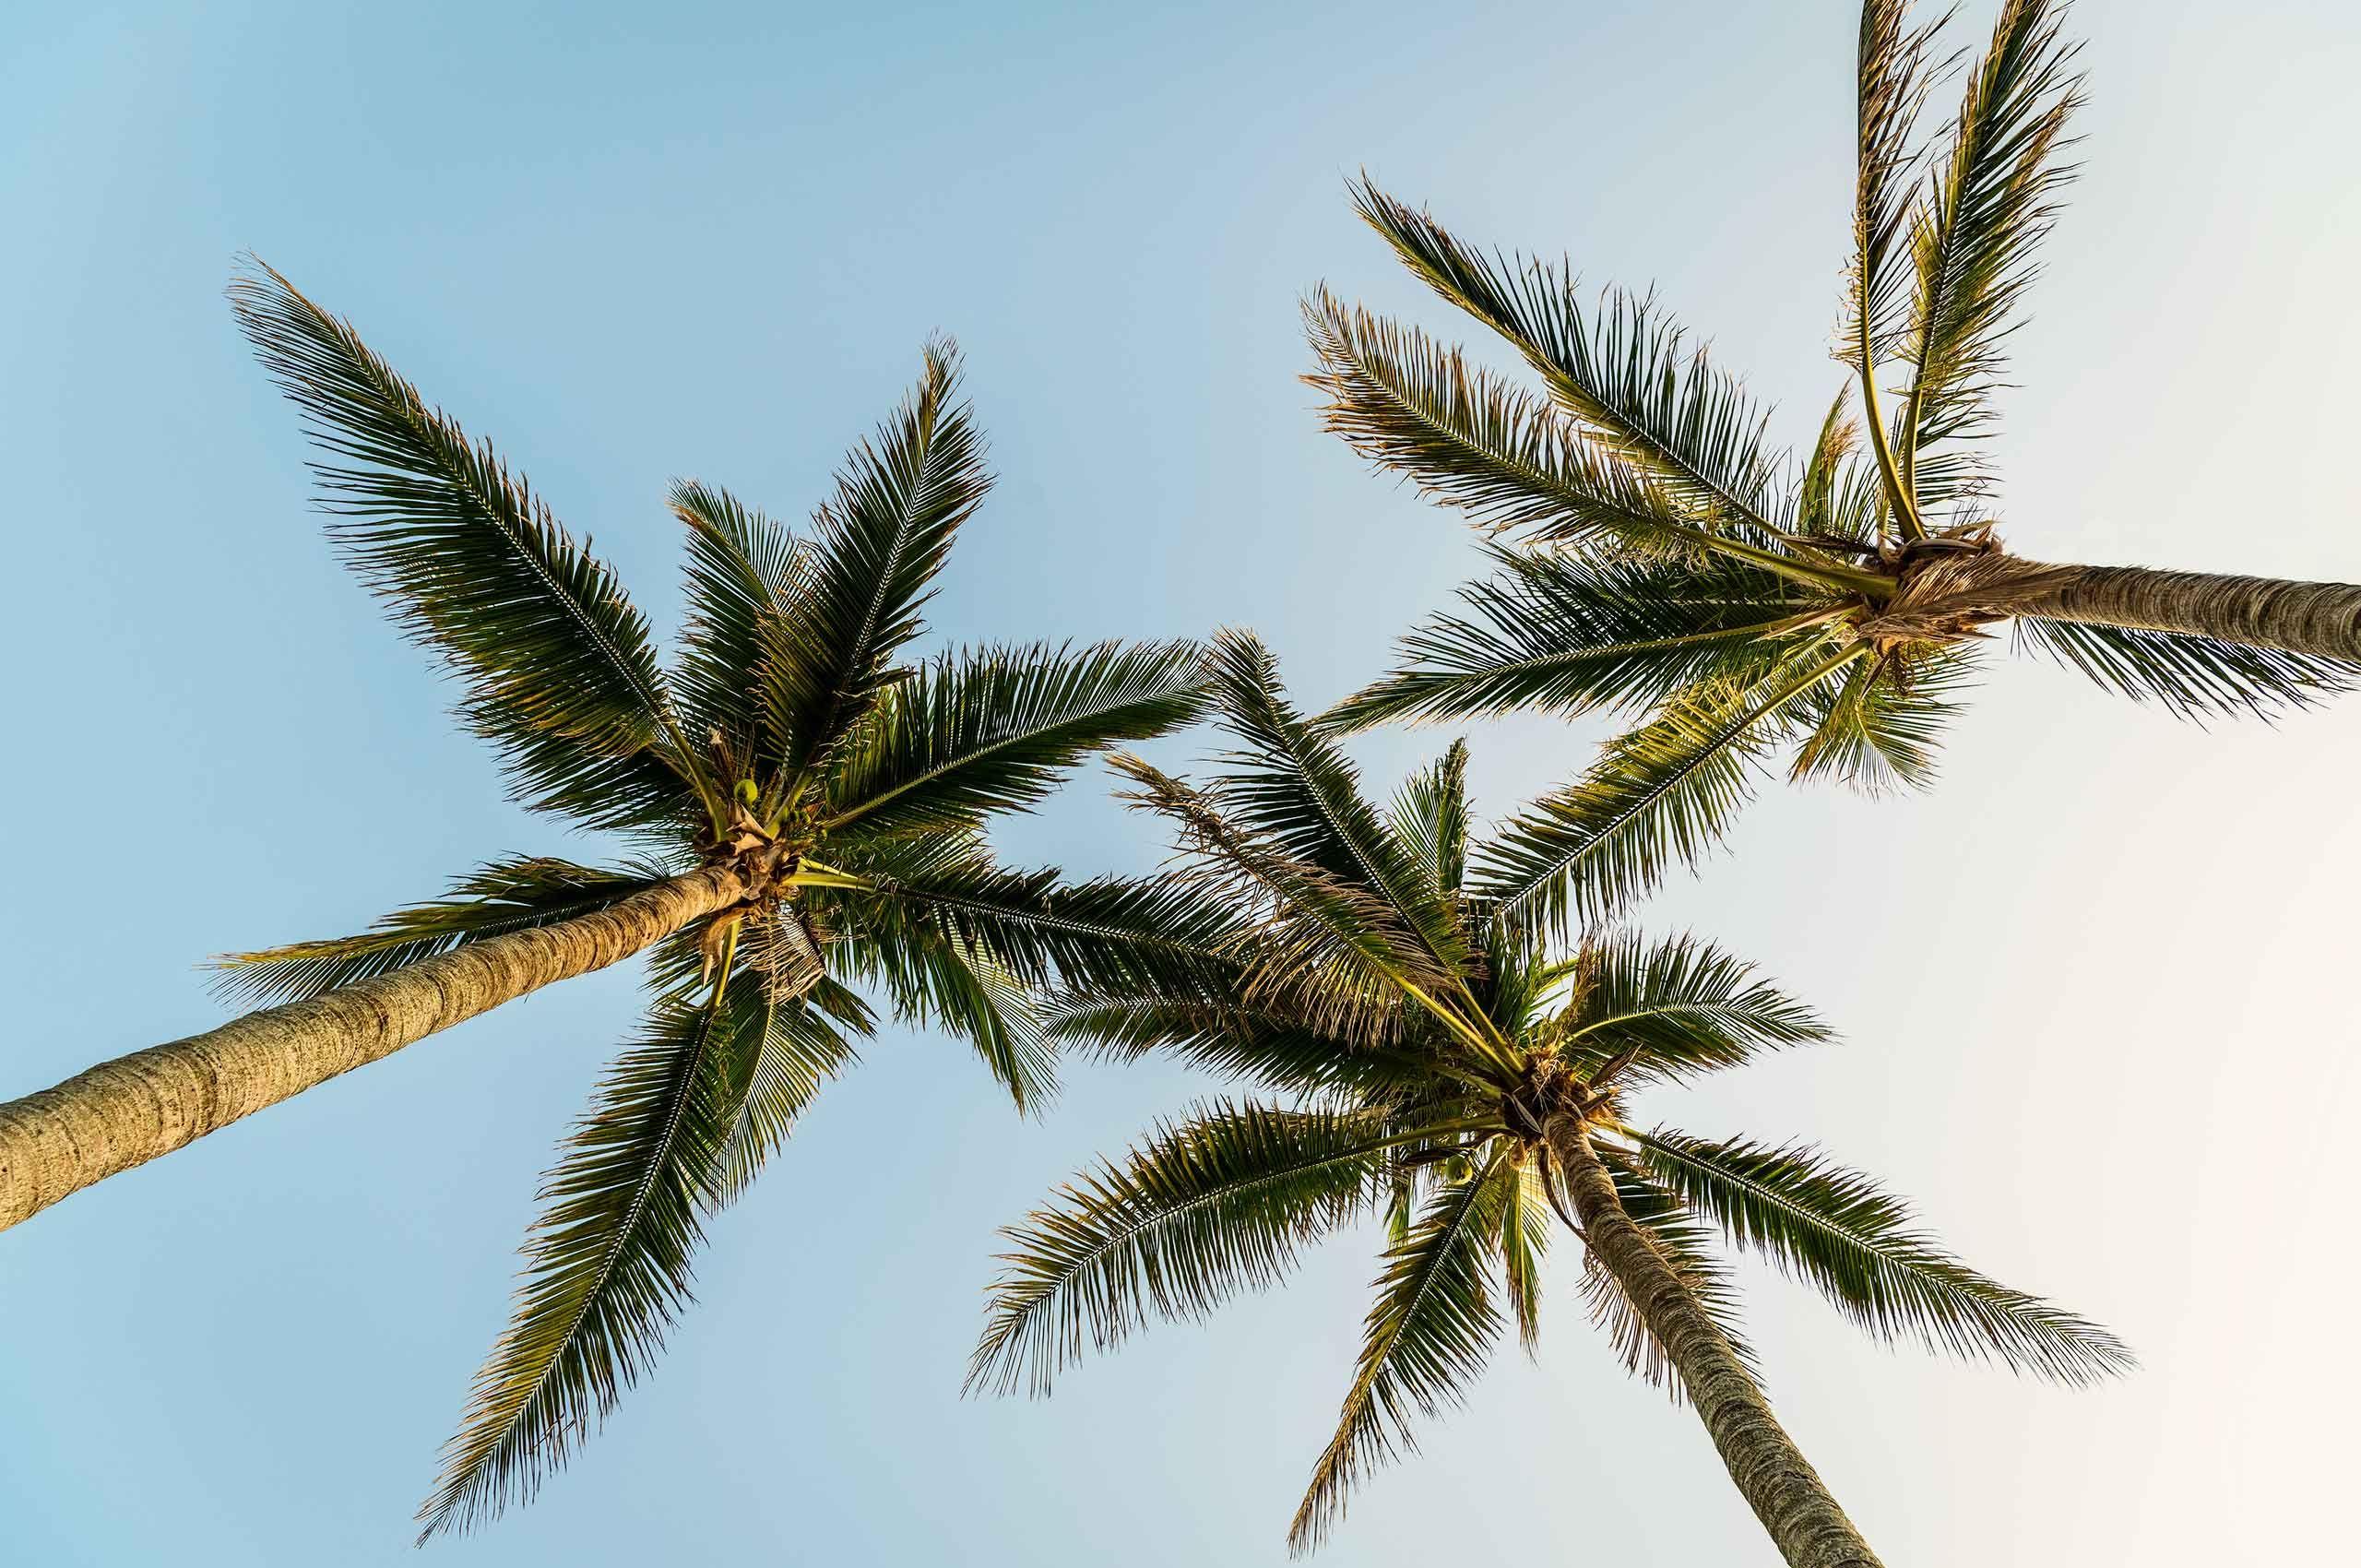 Palmtrees-against-sky-by-HenrikOlundPhotography.jpg